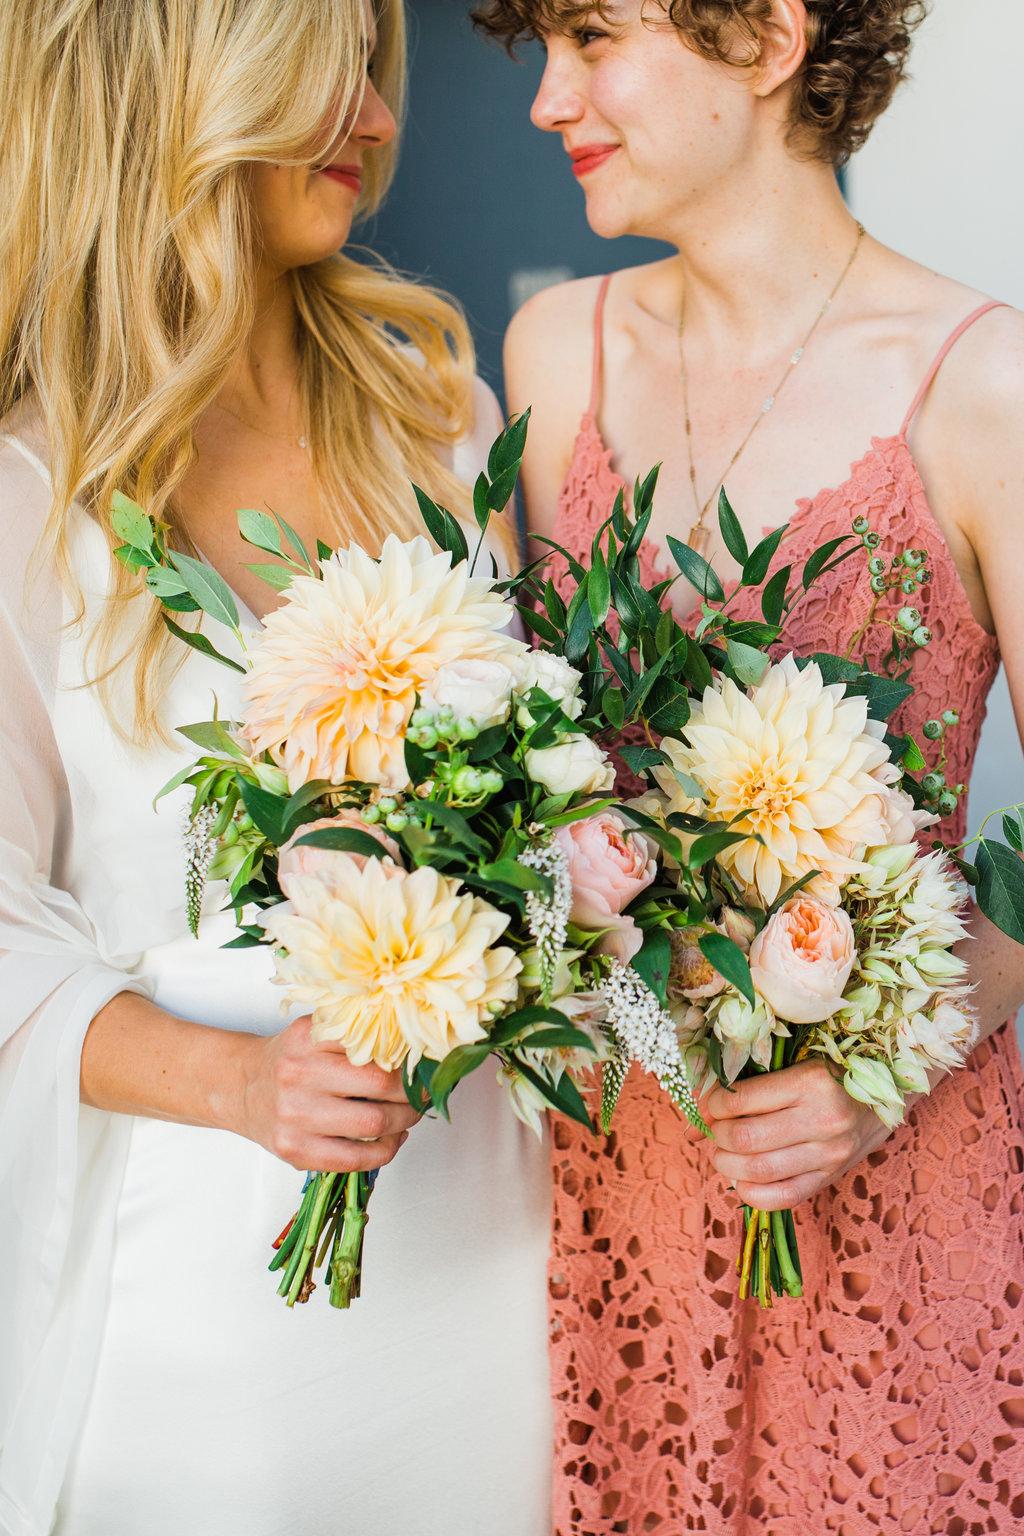 Garden_Dahilas_Bouquets_Sibyl_Sophia_Des_Moines_Iowa.jpg